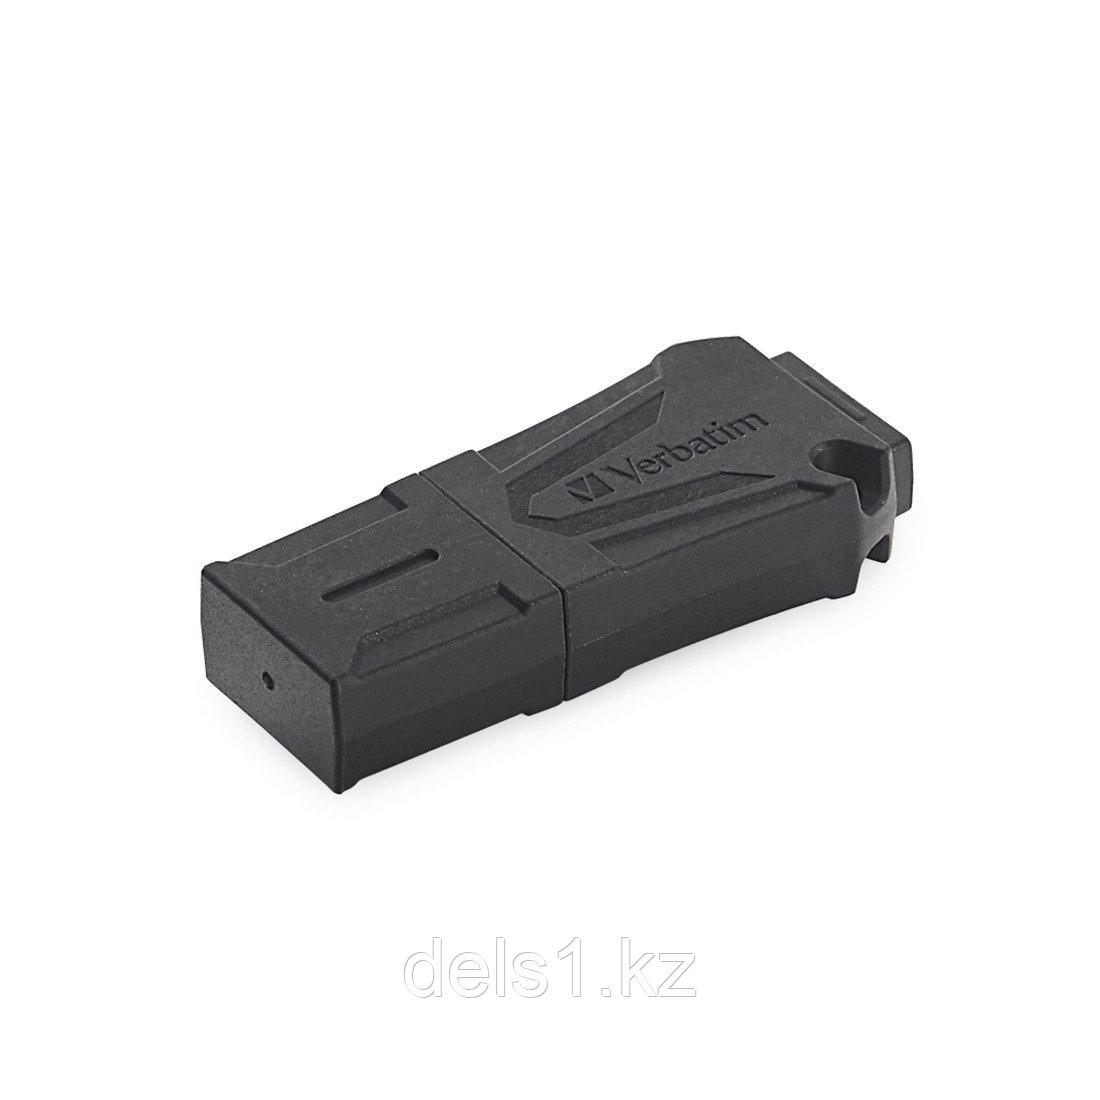 USB-накопитель Verbatim 49332 64GB USB 2.0 Чёрный